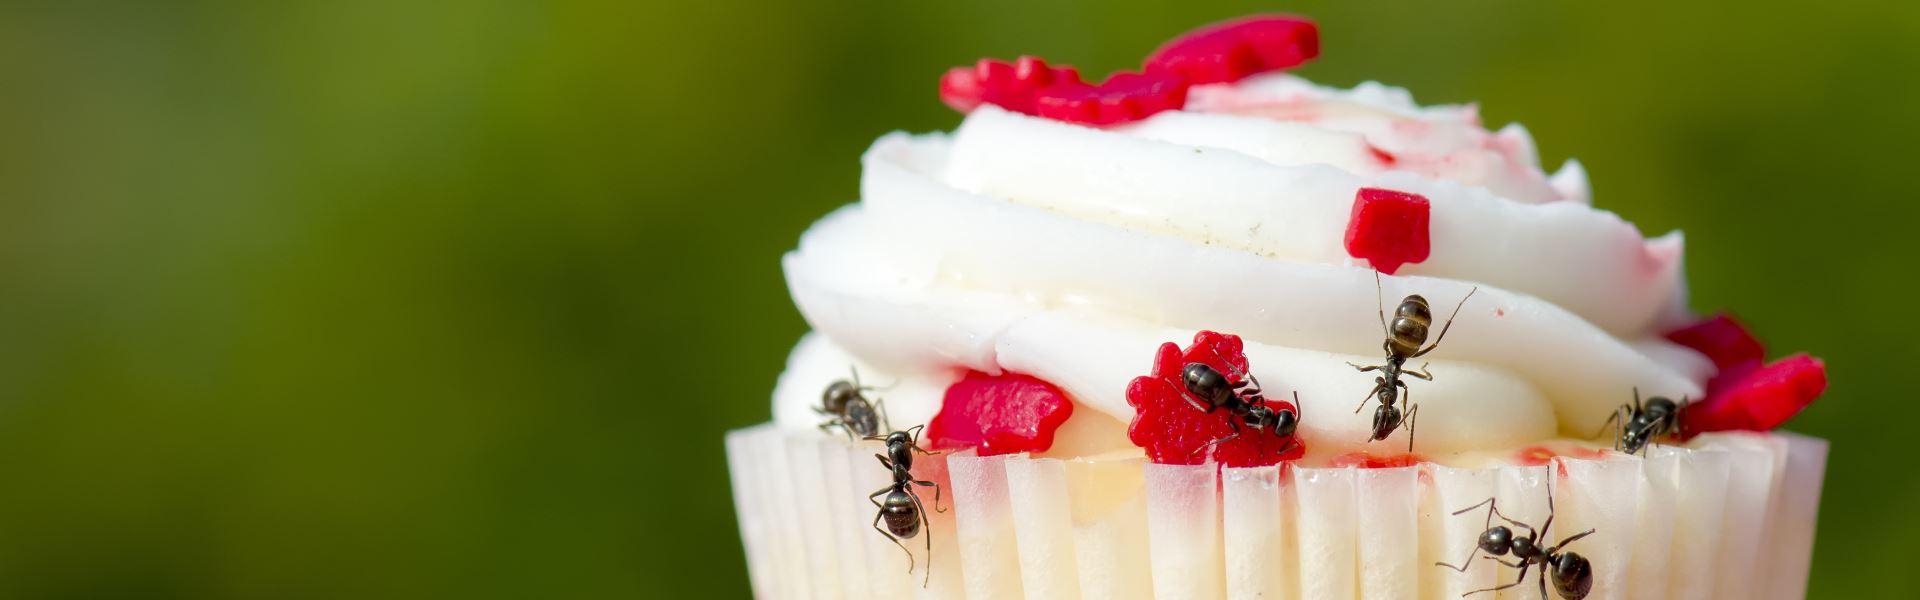 Борьба с домашними муравьями дома